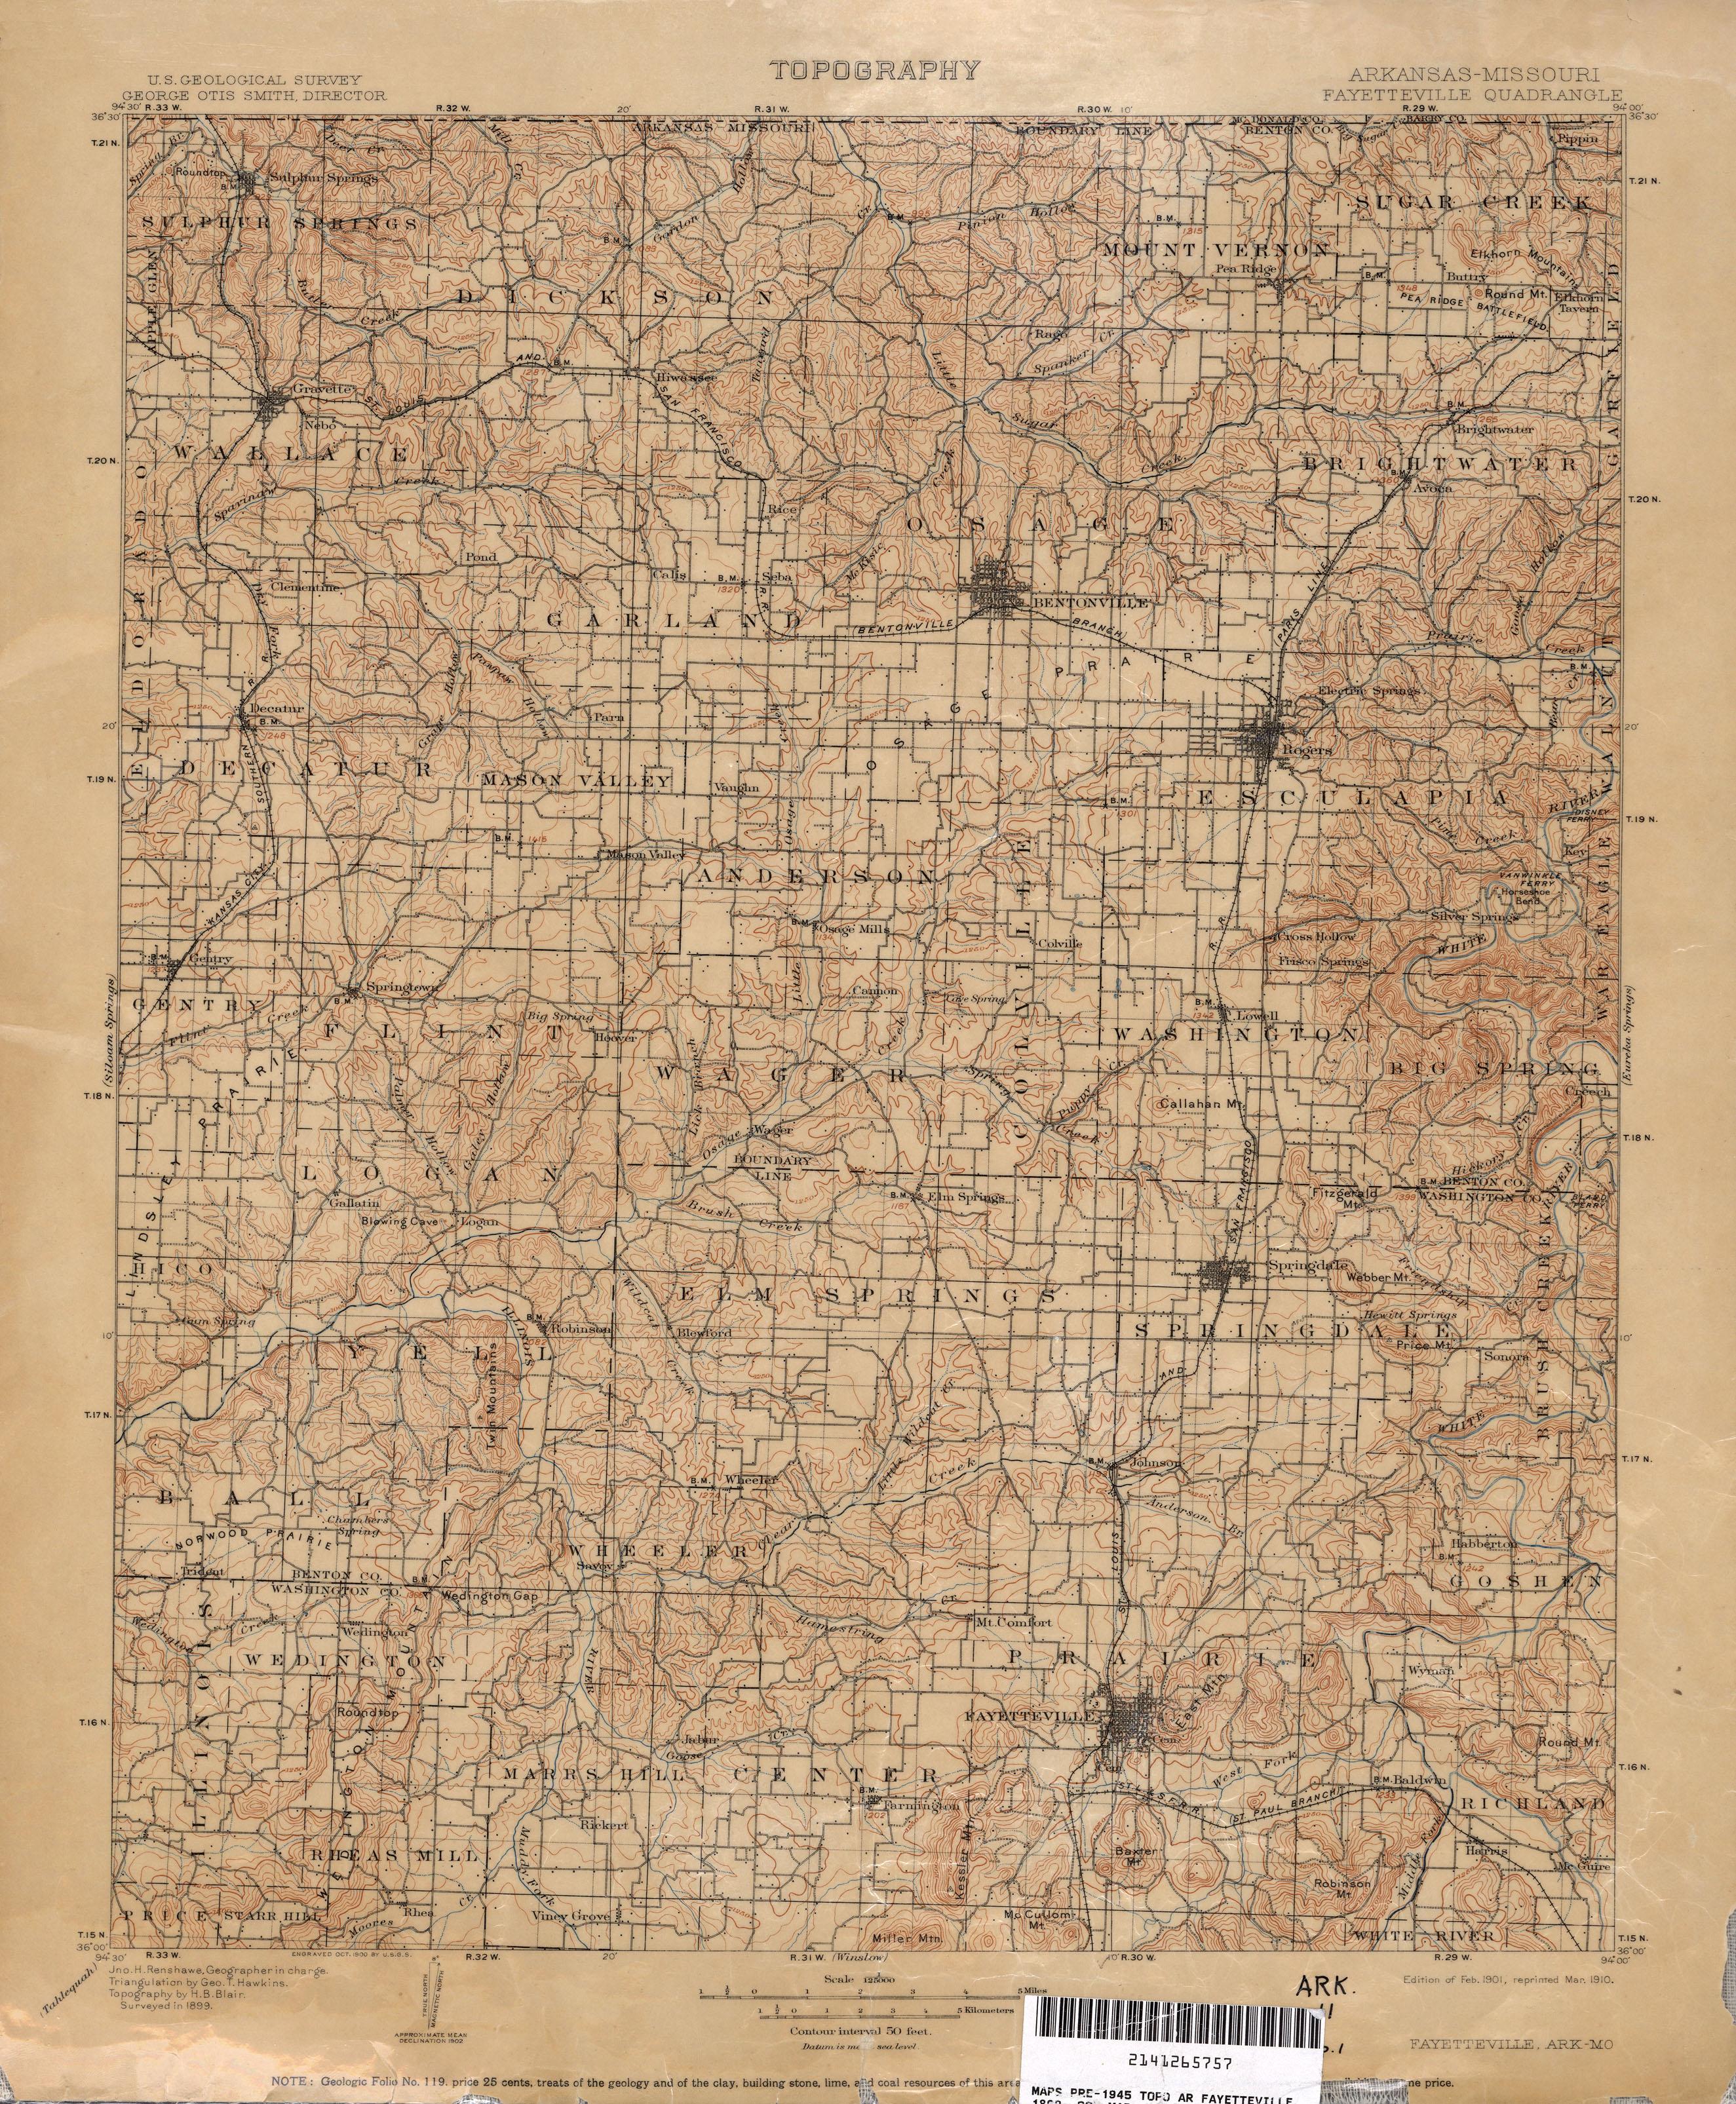 Topographic Map Of Nw Arkansas Surveyed In 1899 Arkansas